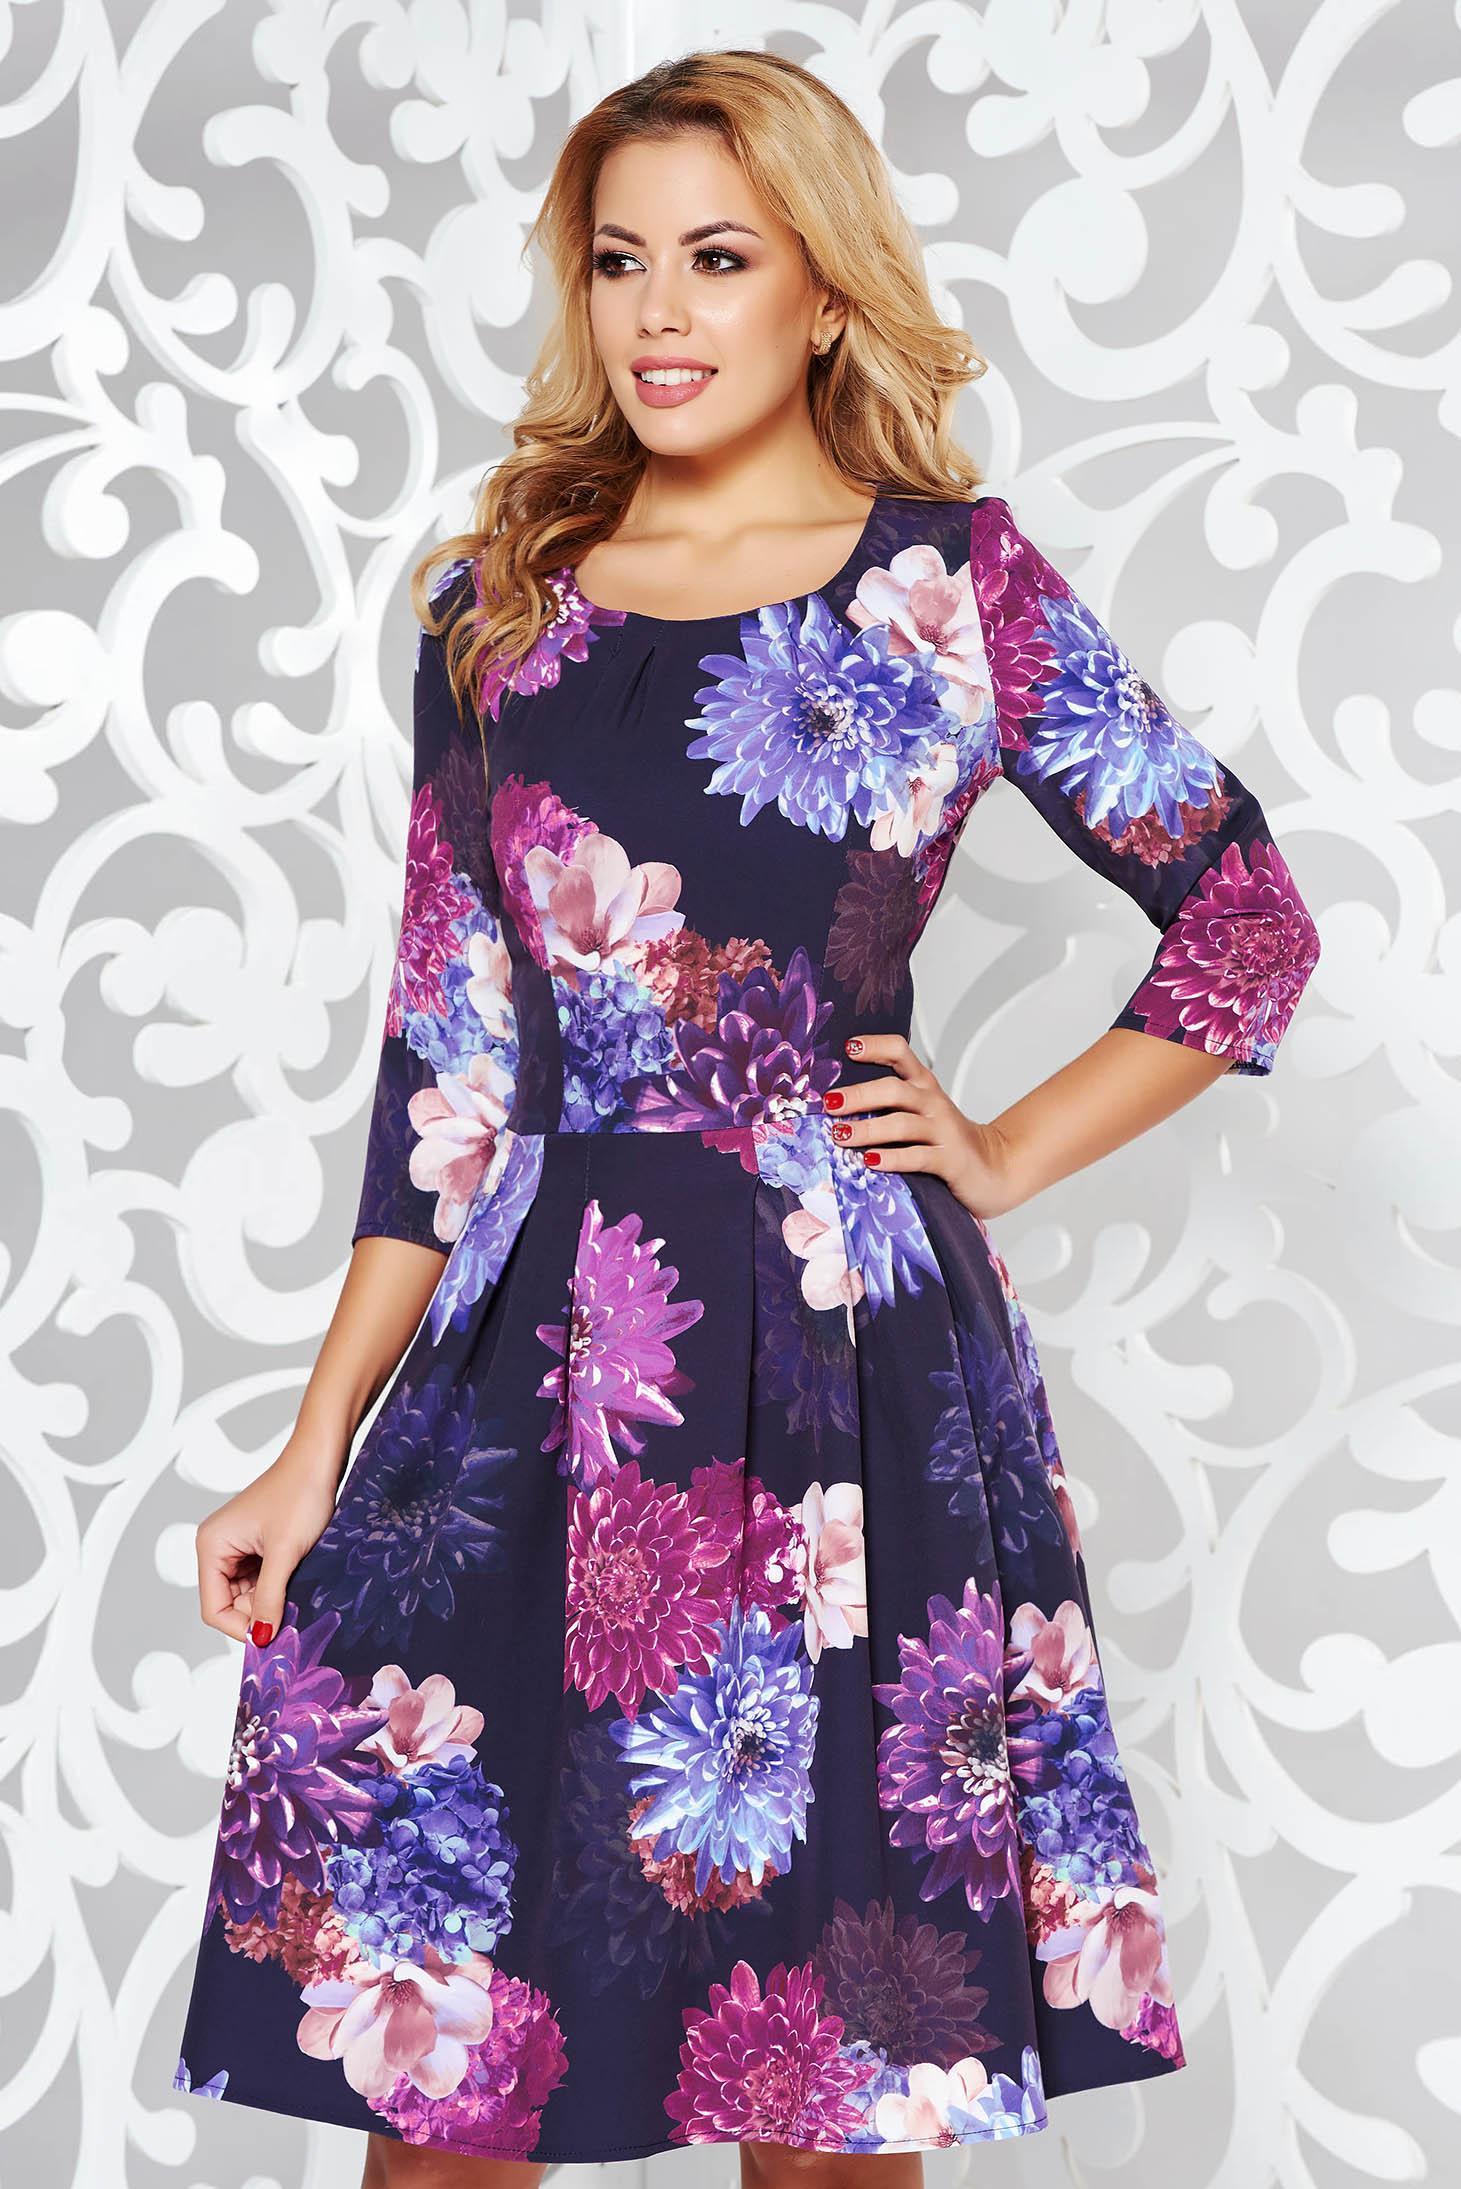 Rochie neagra eleganta in clos din stofa usor elastica cu imprimeu floral